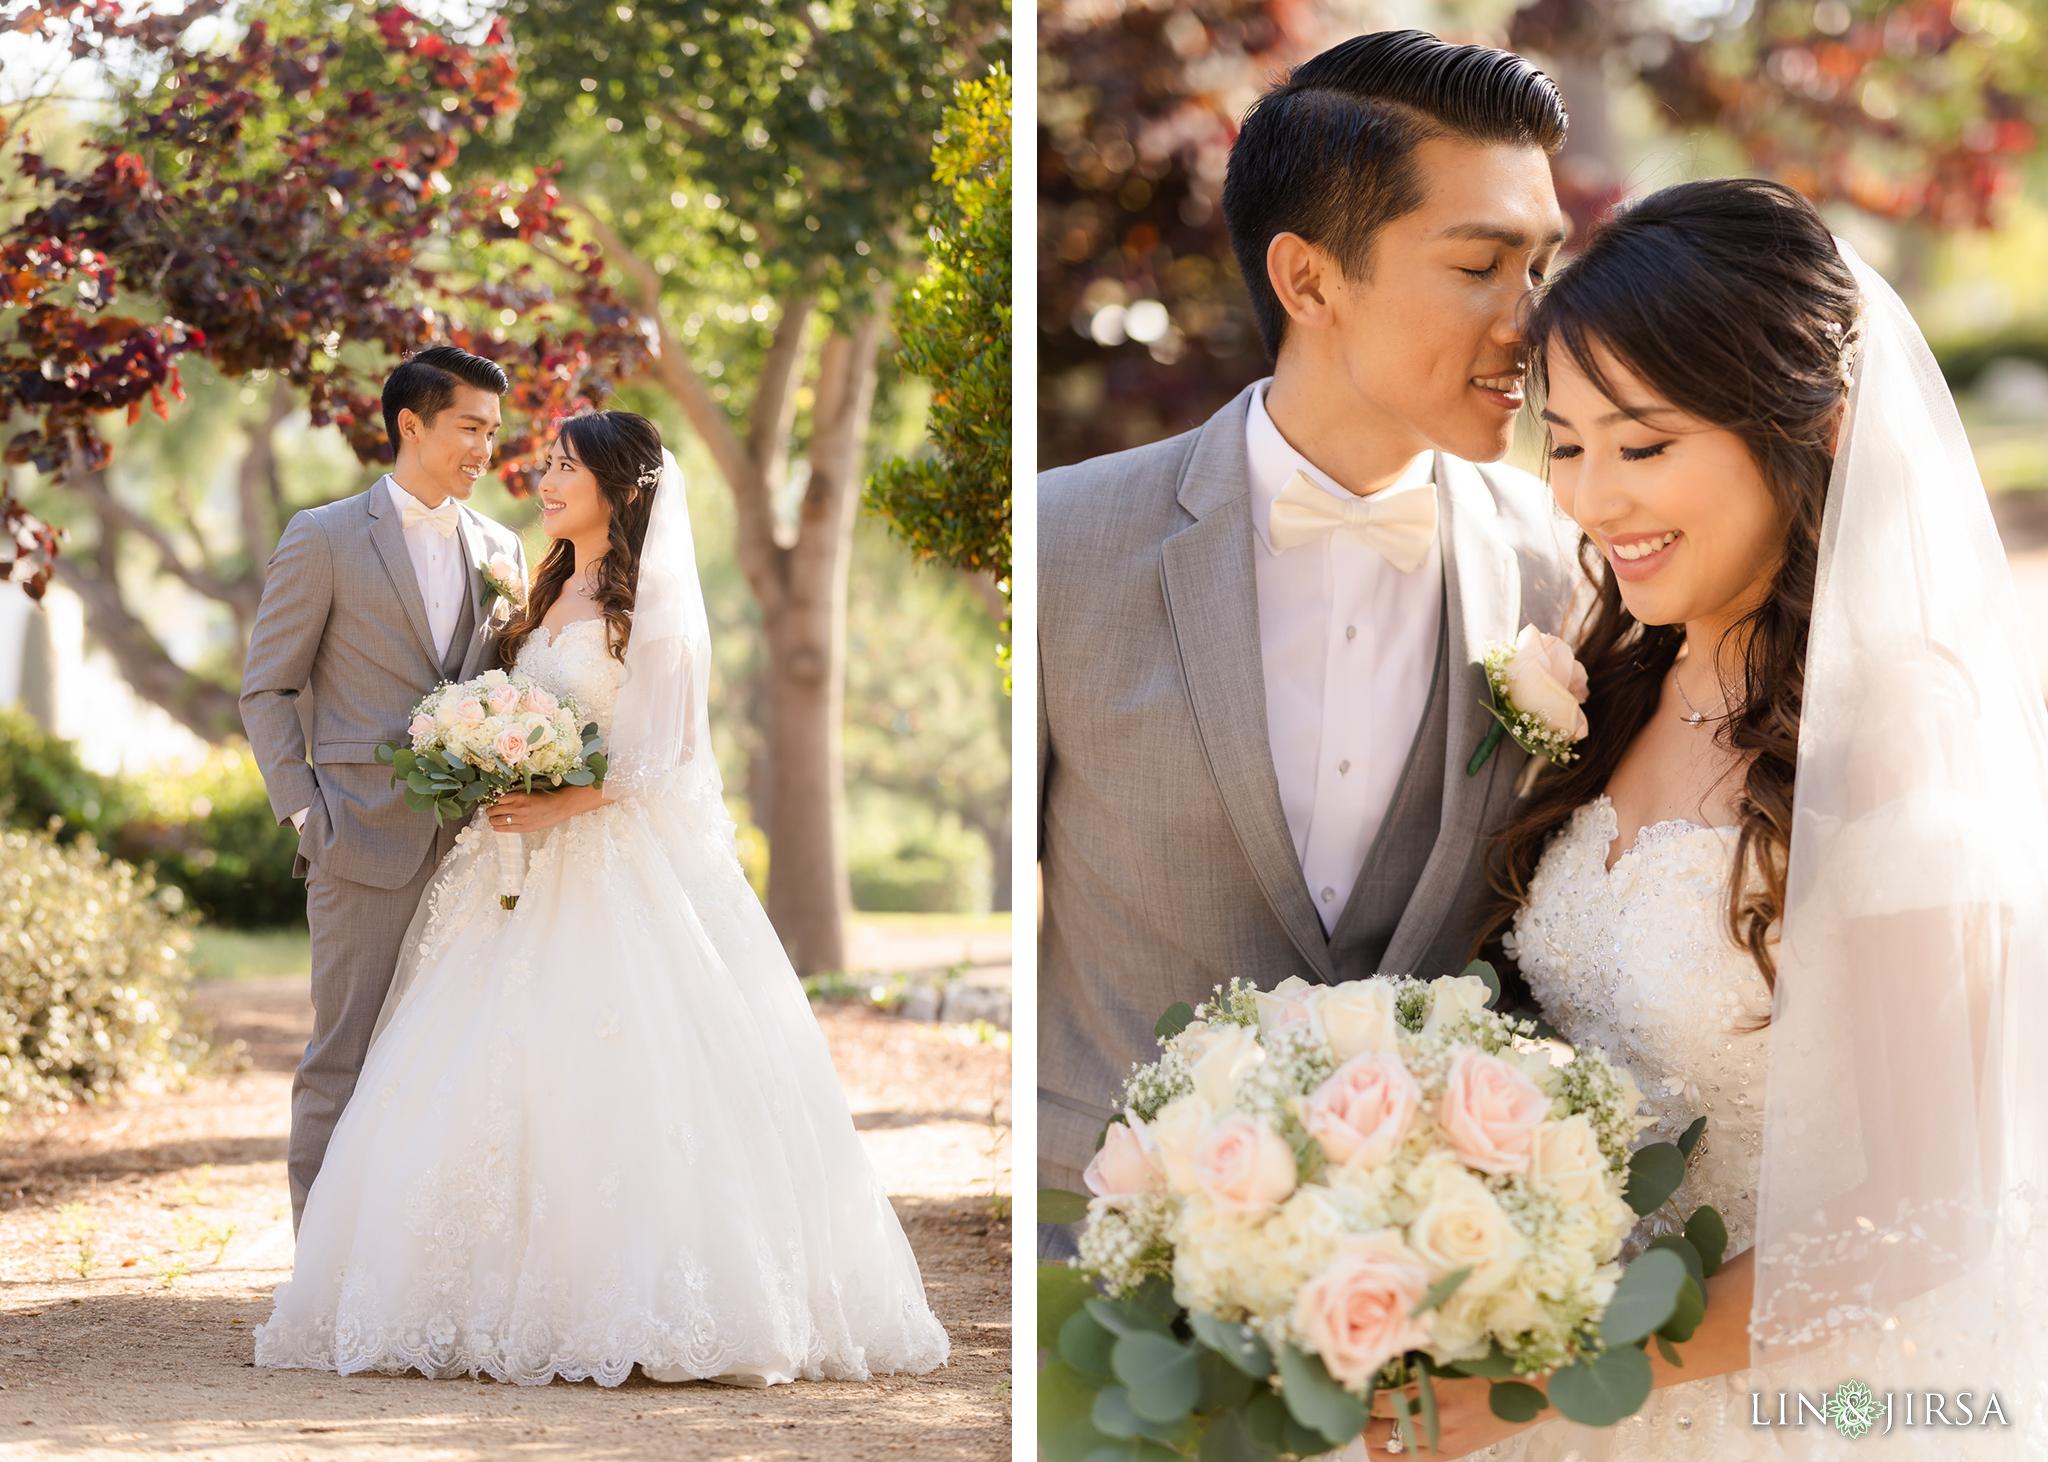 zbb Malaga Cove Plaza Rancho Palos Verdes Engagement Photography